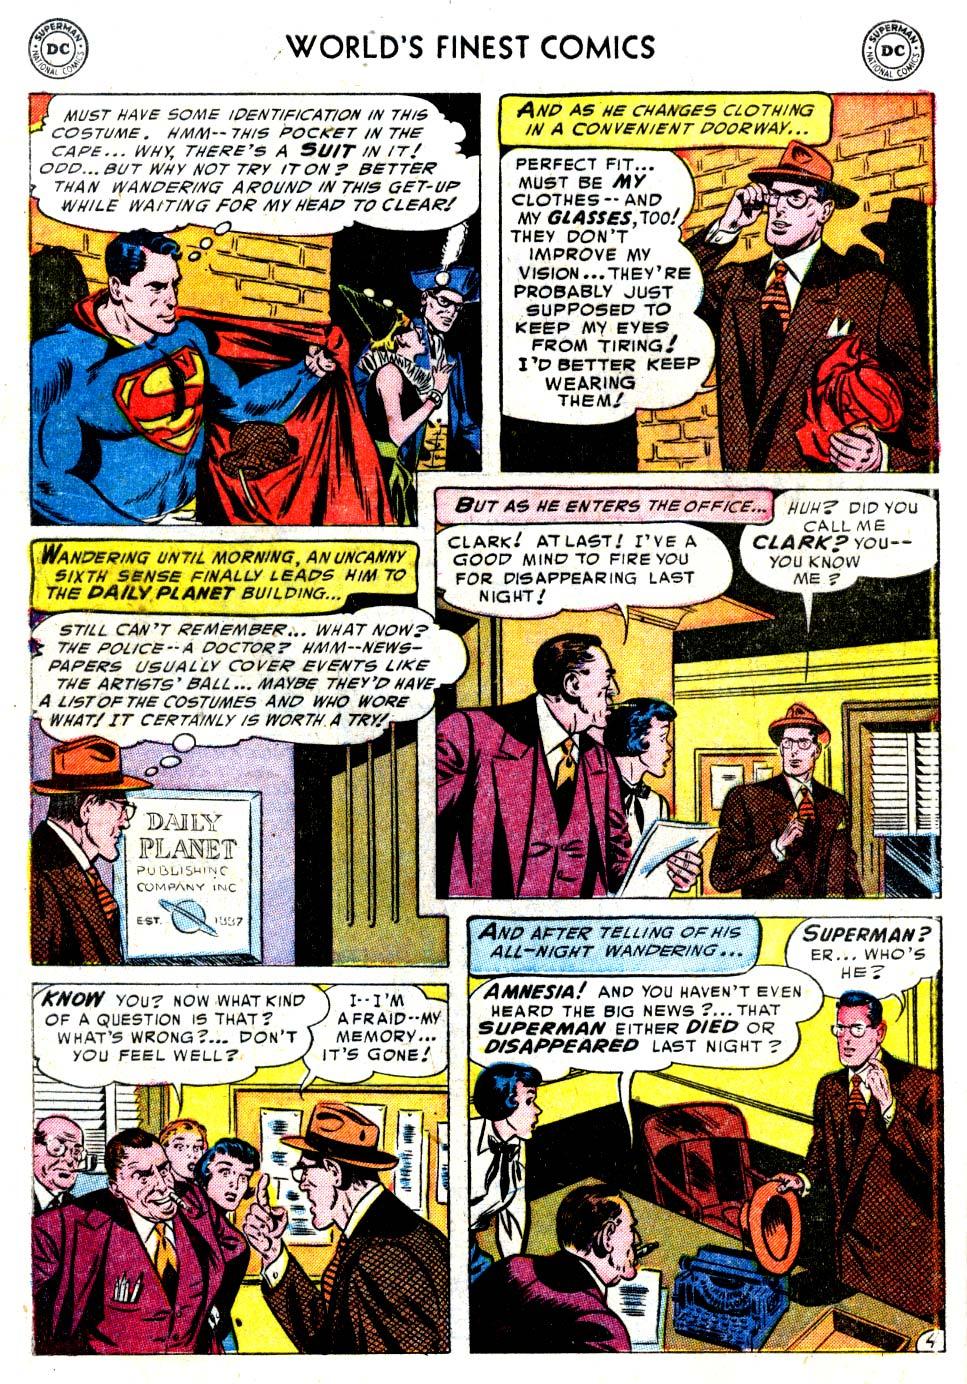 Read online World's Finest Comics comic -  Issue #68 - 6